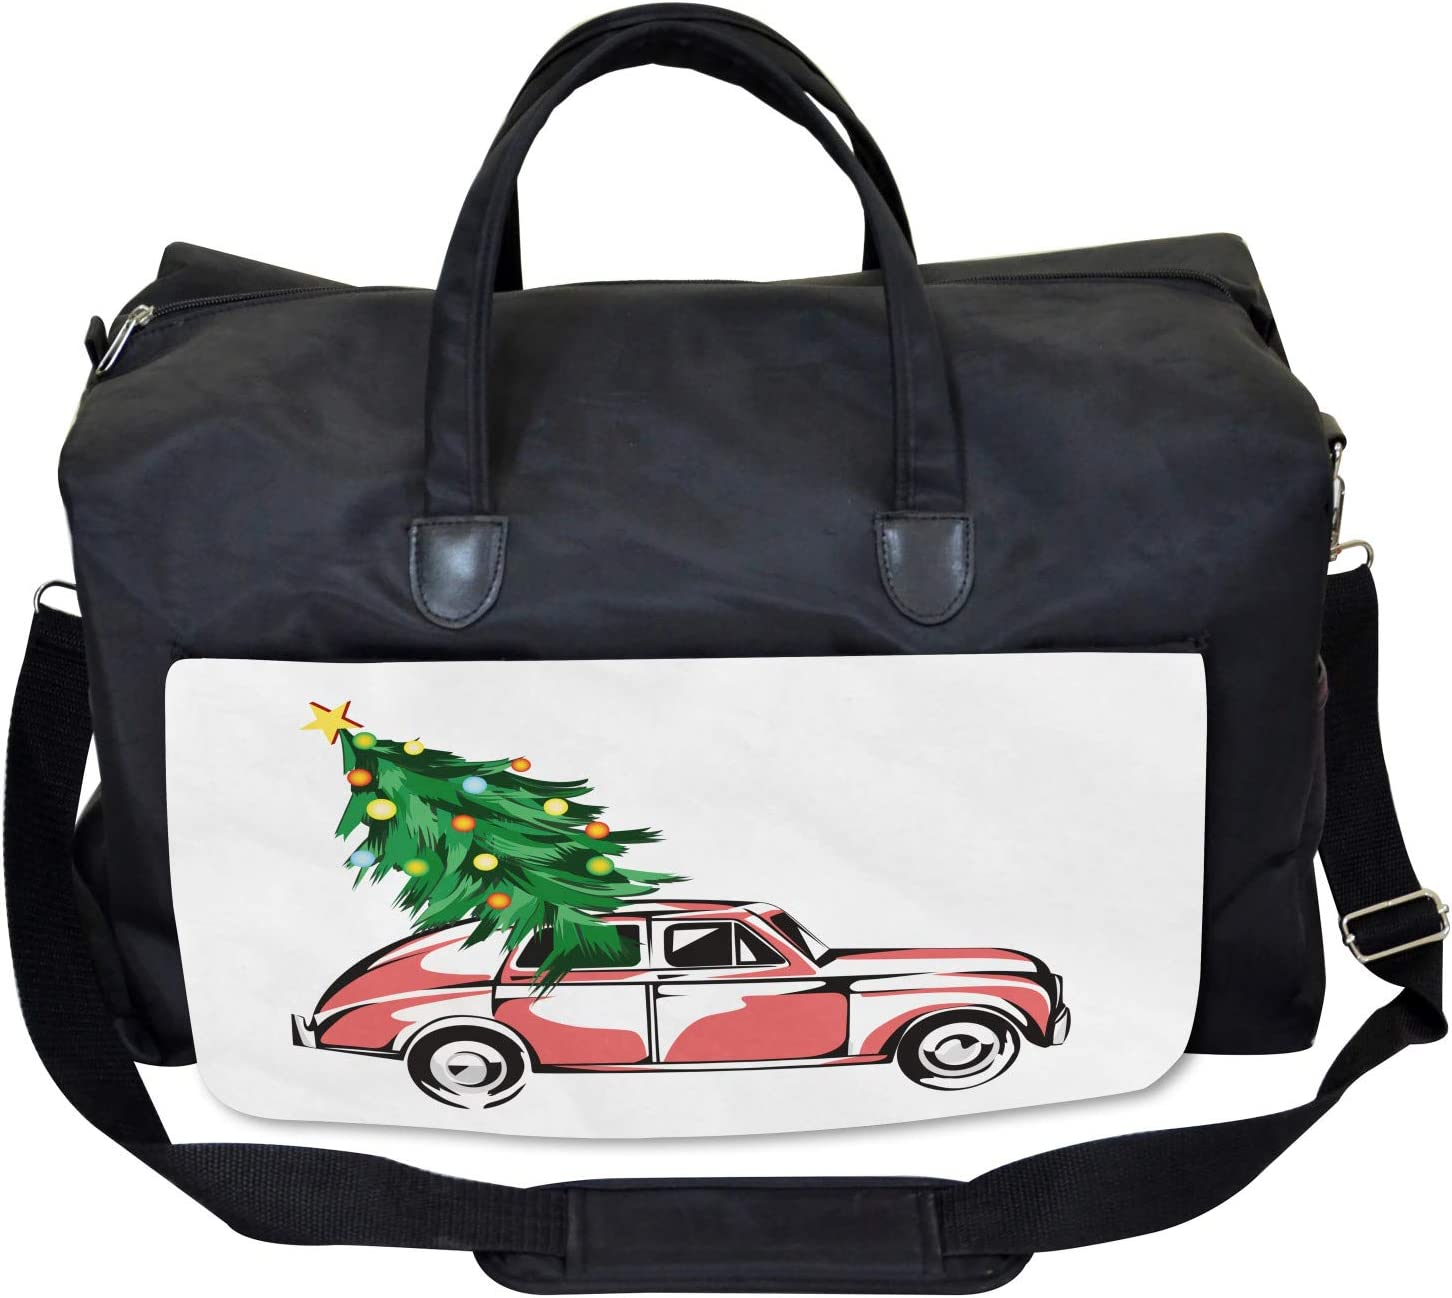 Ambesonne Christmas Gym Bag Large Weekender Carry-on Retro Car Xmas Tree